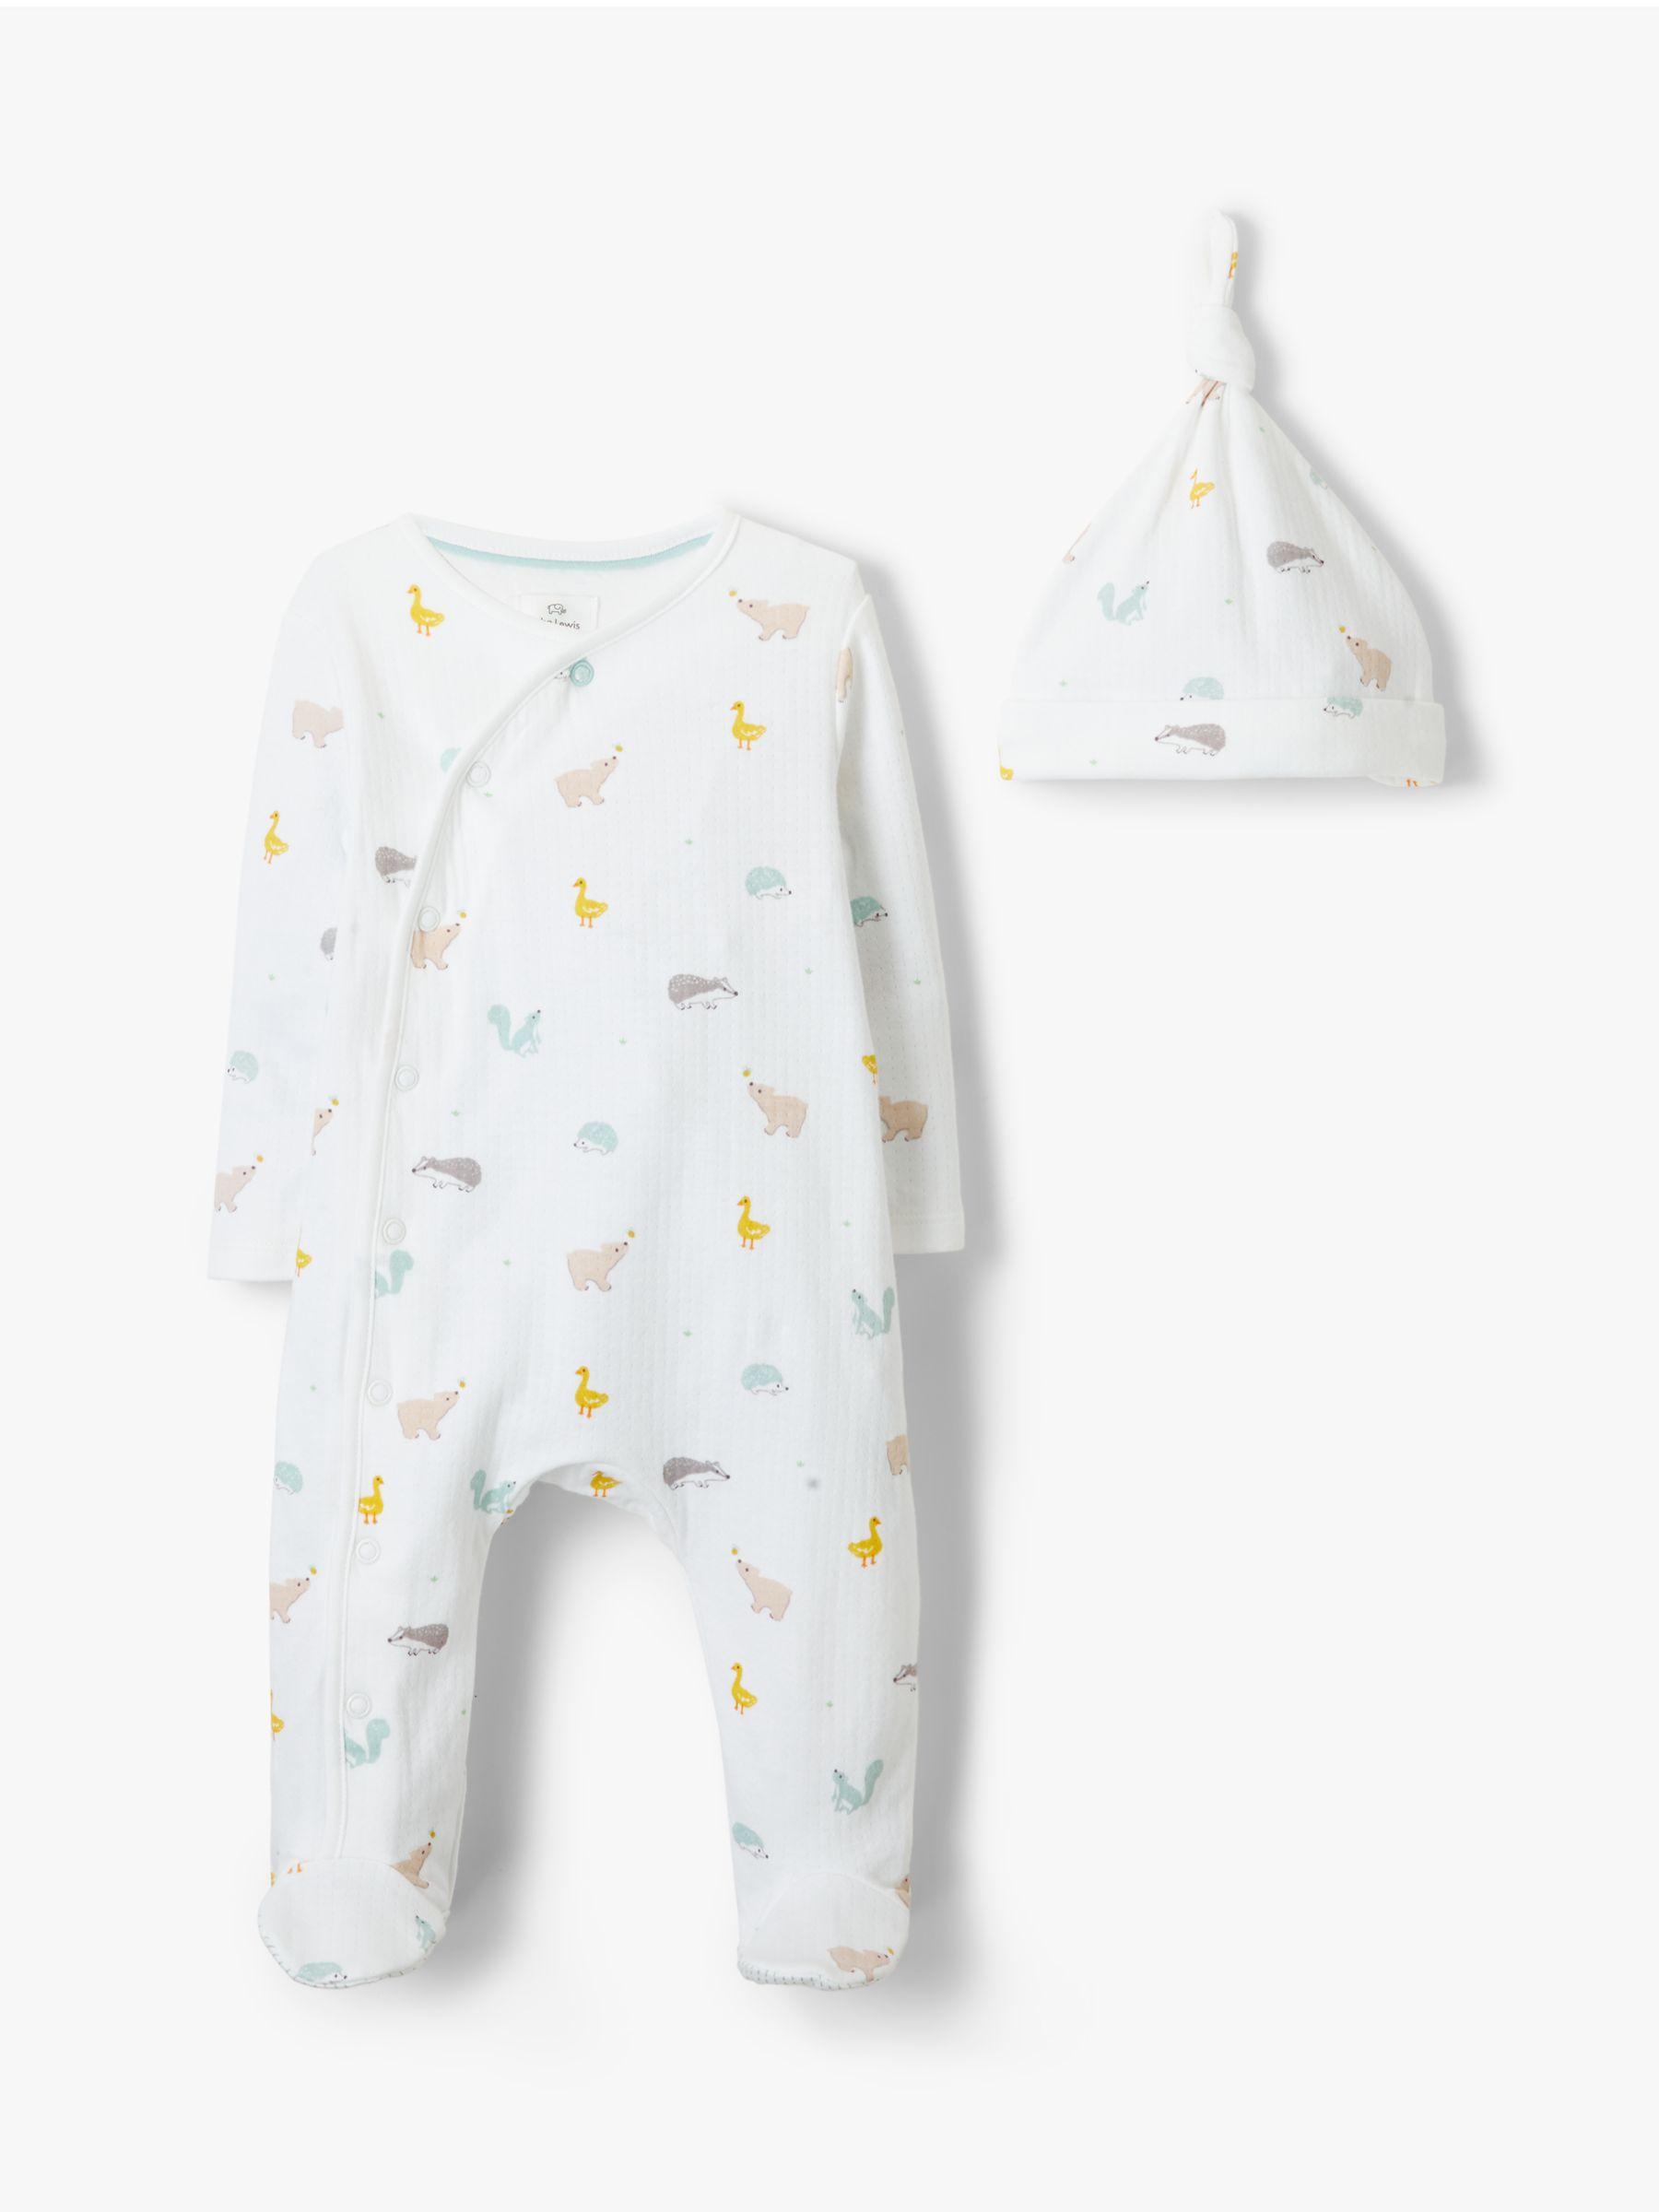 9 Months Pack of 2 Baby Boys Little Friends Sleepsuits Newborn